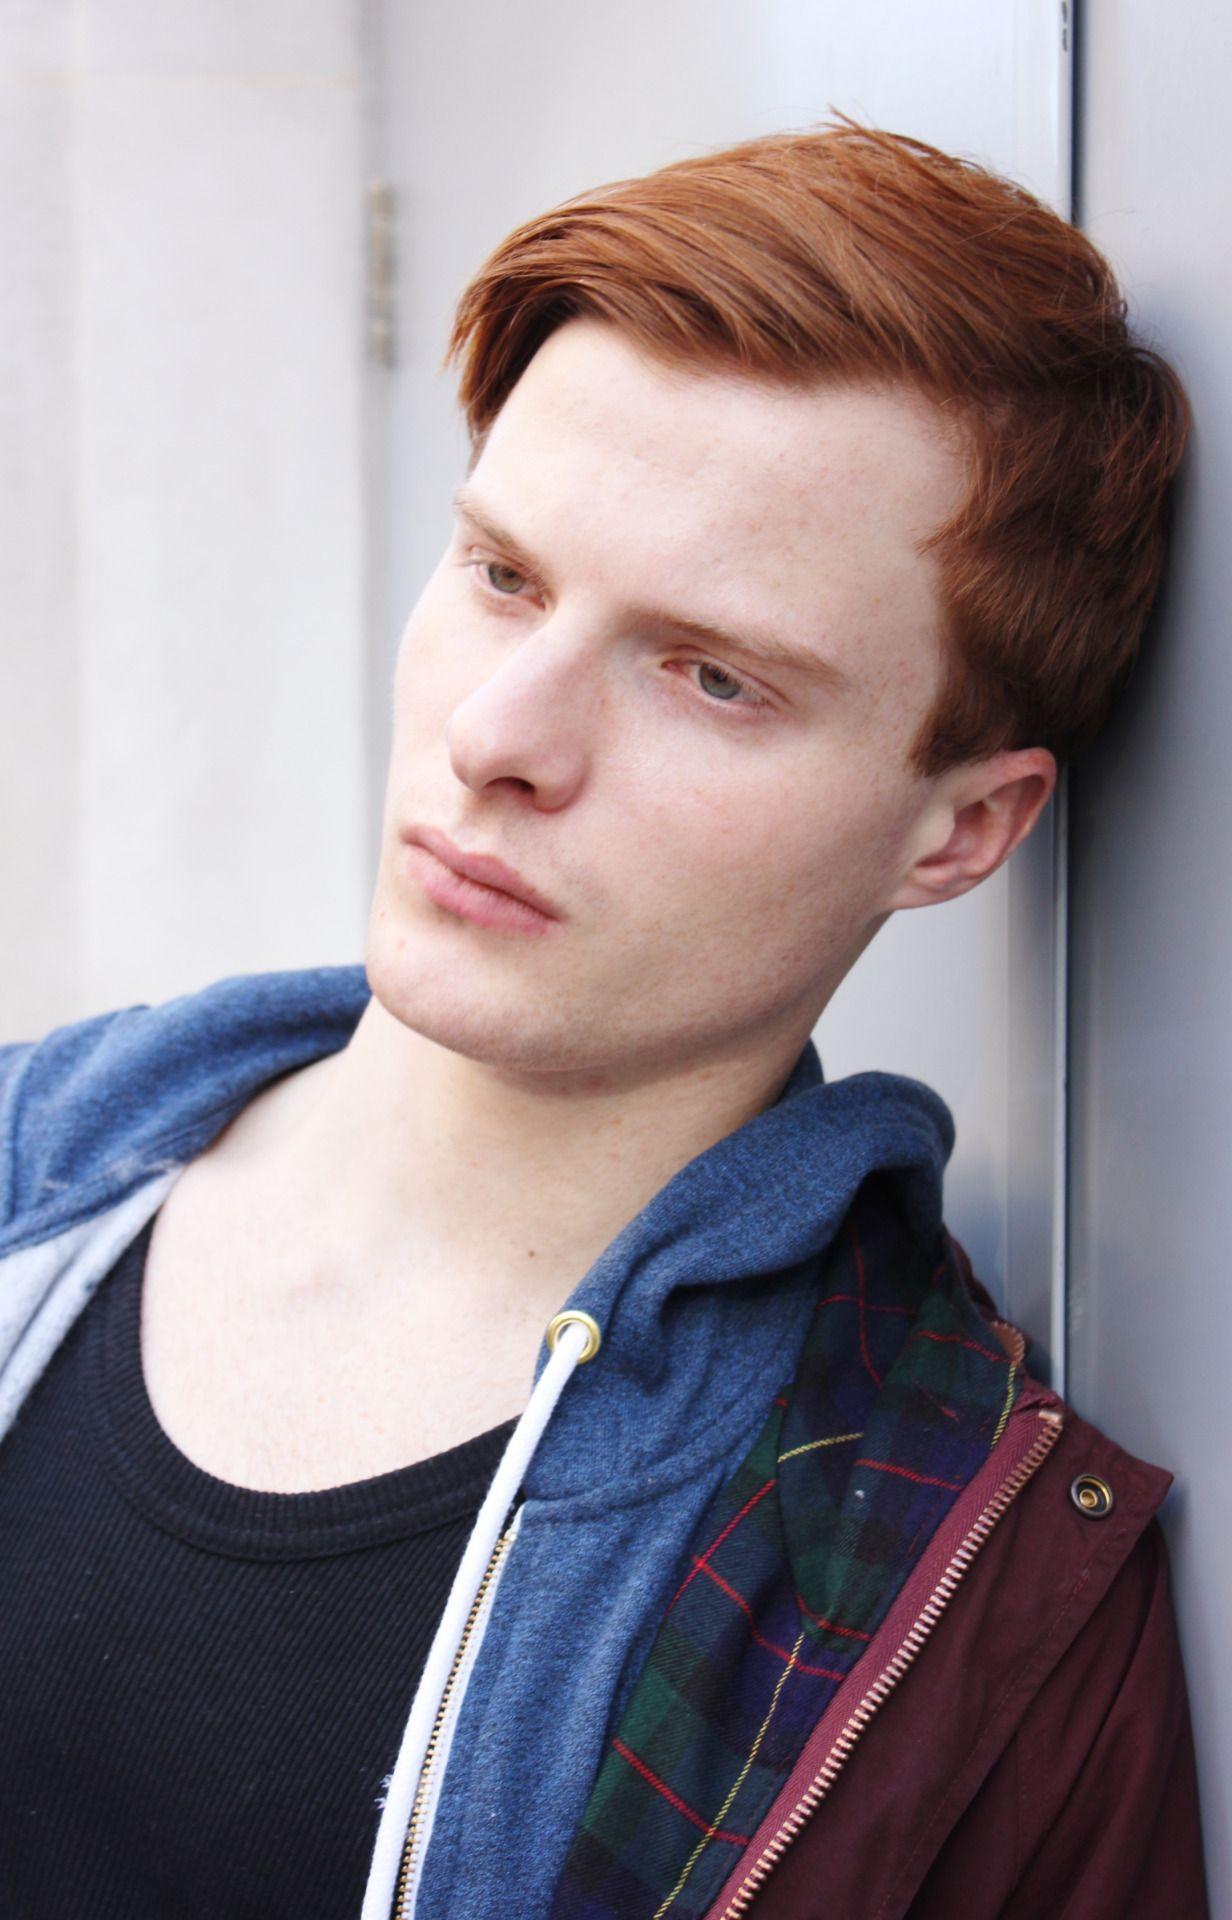 Redhead boy haircuts pin by juanda díaz meckler on haircuts u beards  pinterest  ginger